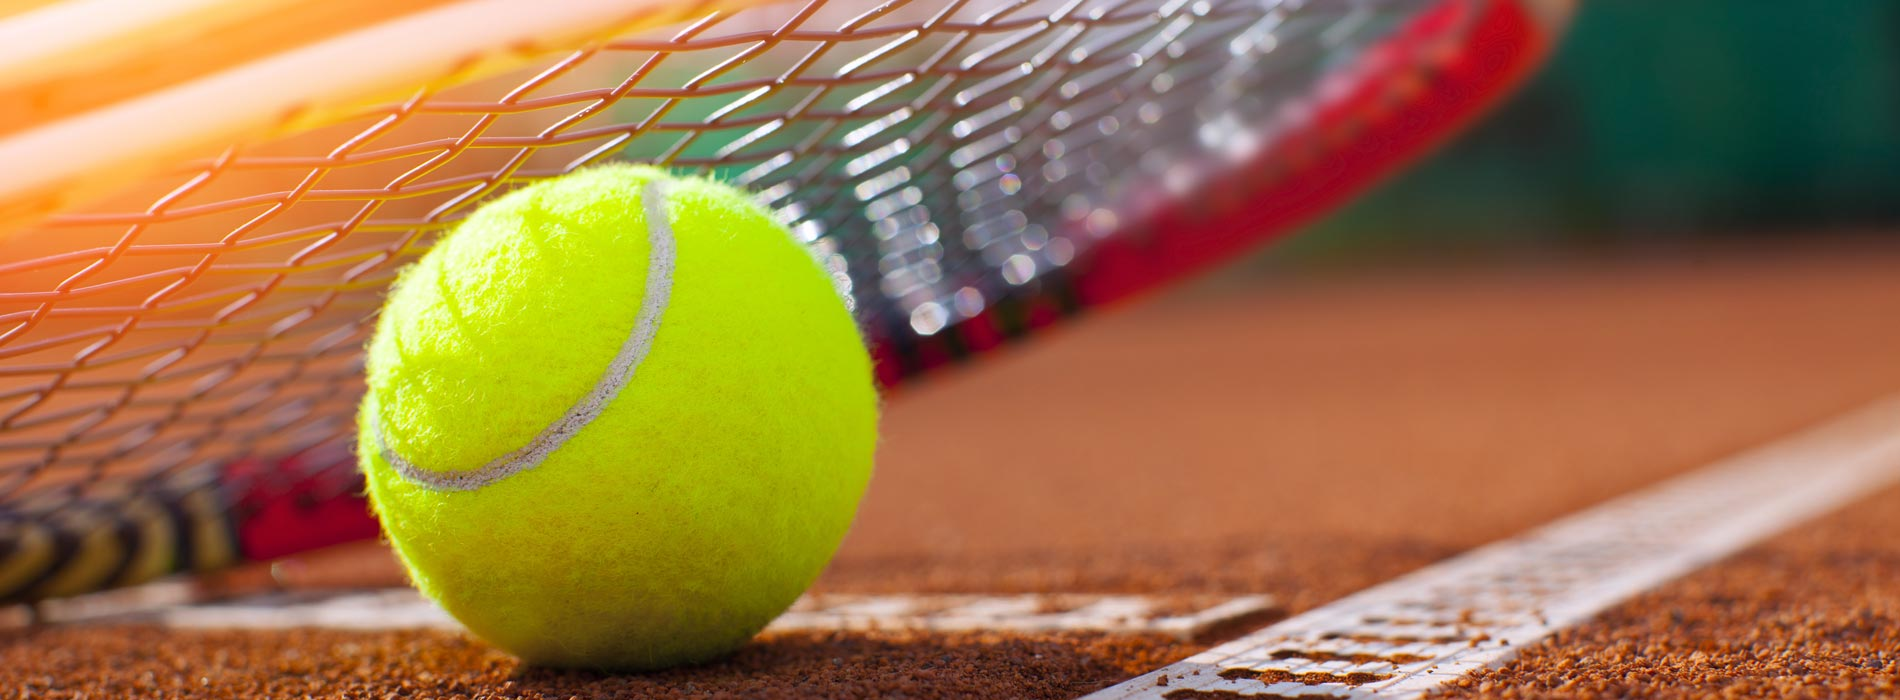 header_tennis